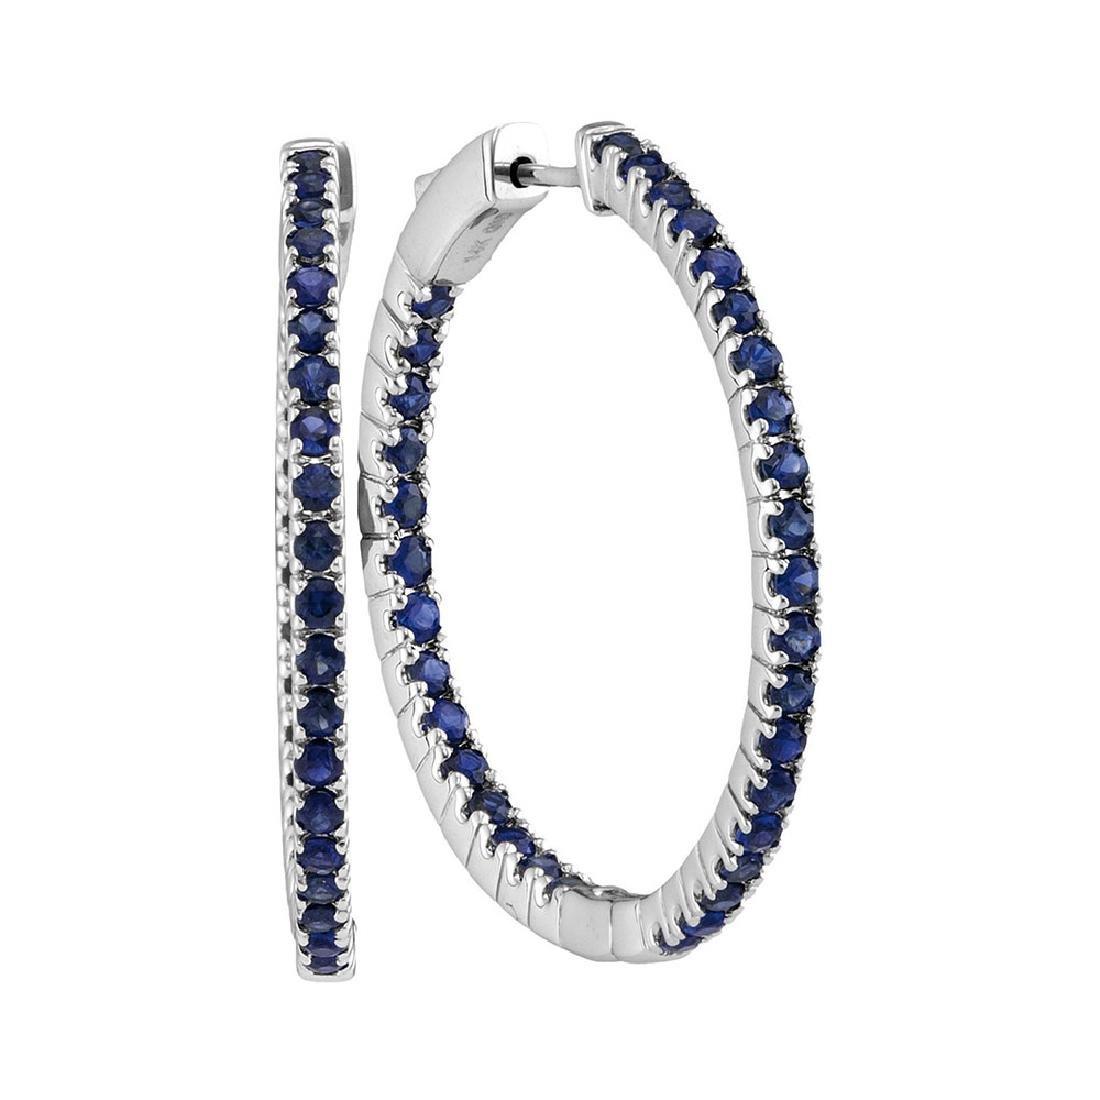 2.75 CTW Blue Sapphire Hoop Earrings 14KT White Gold -